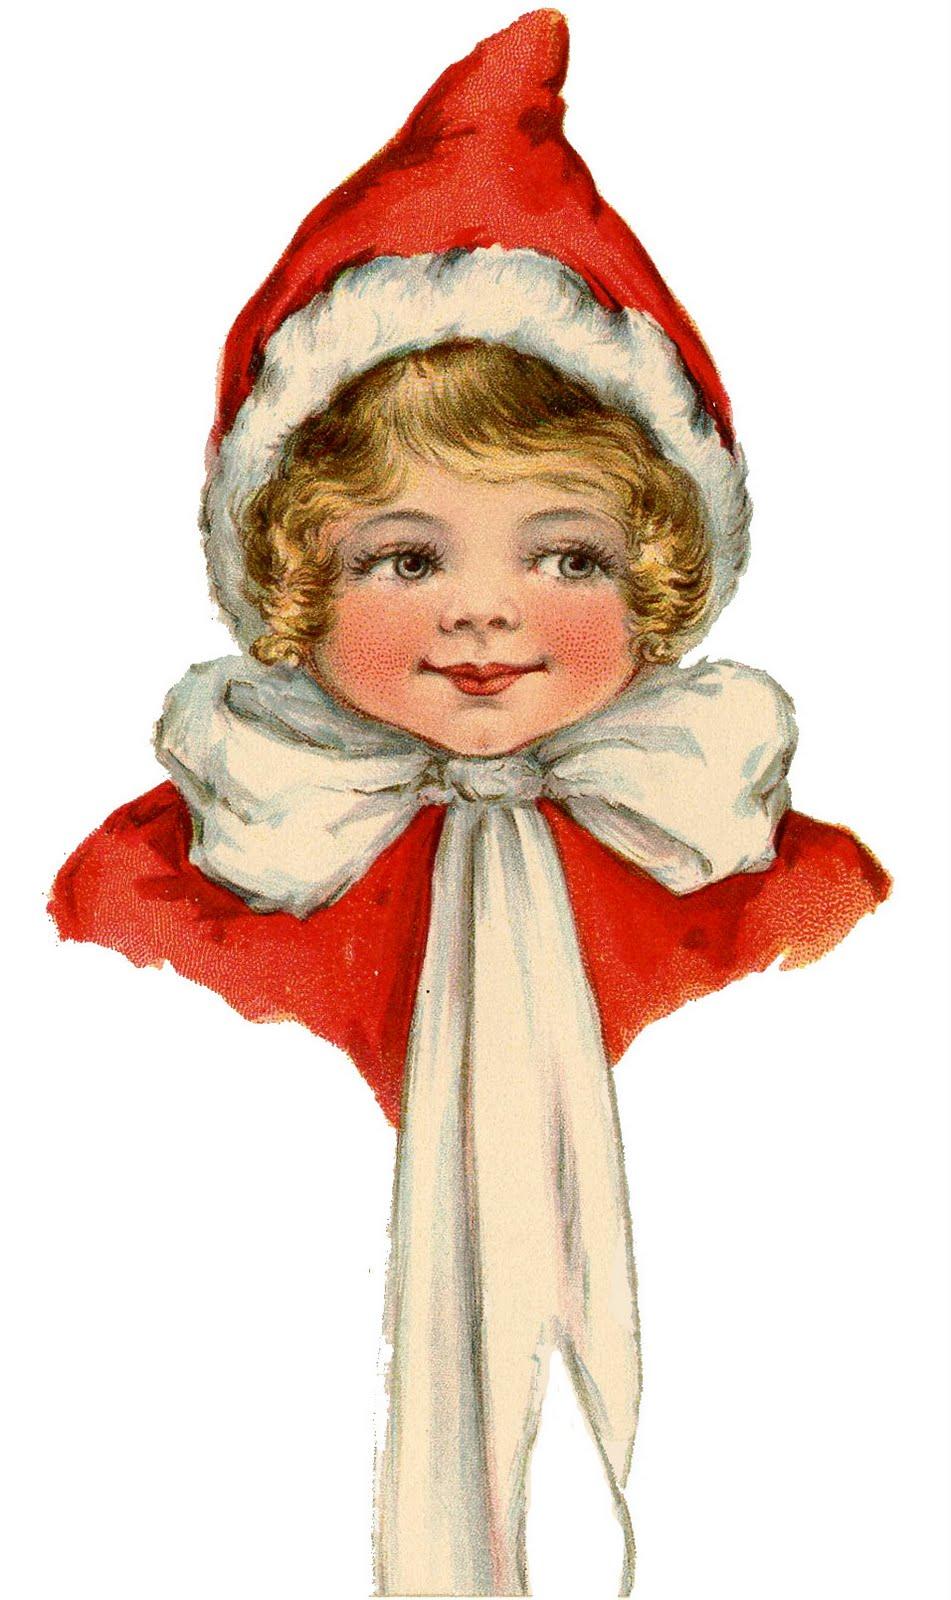 Vintage Christmas Clip Art - Adorable Elf Girl - The ...